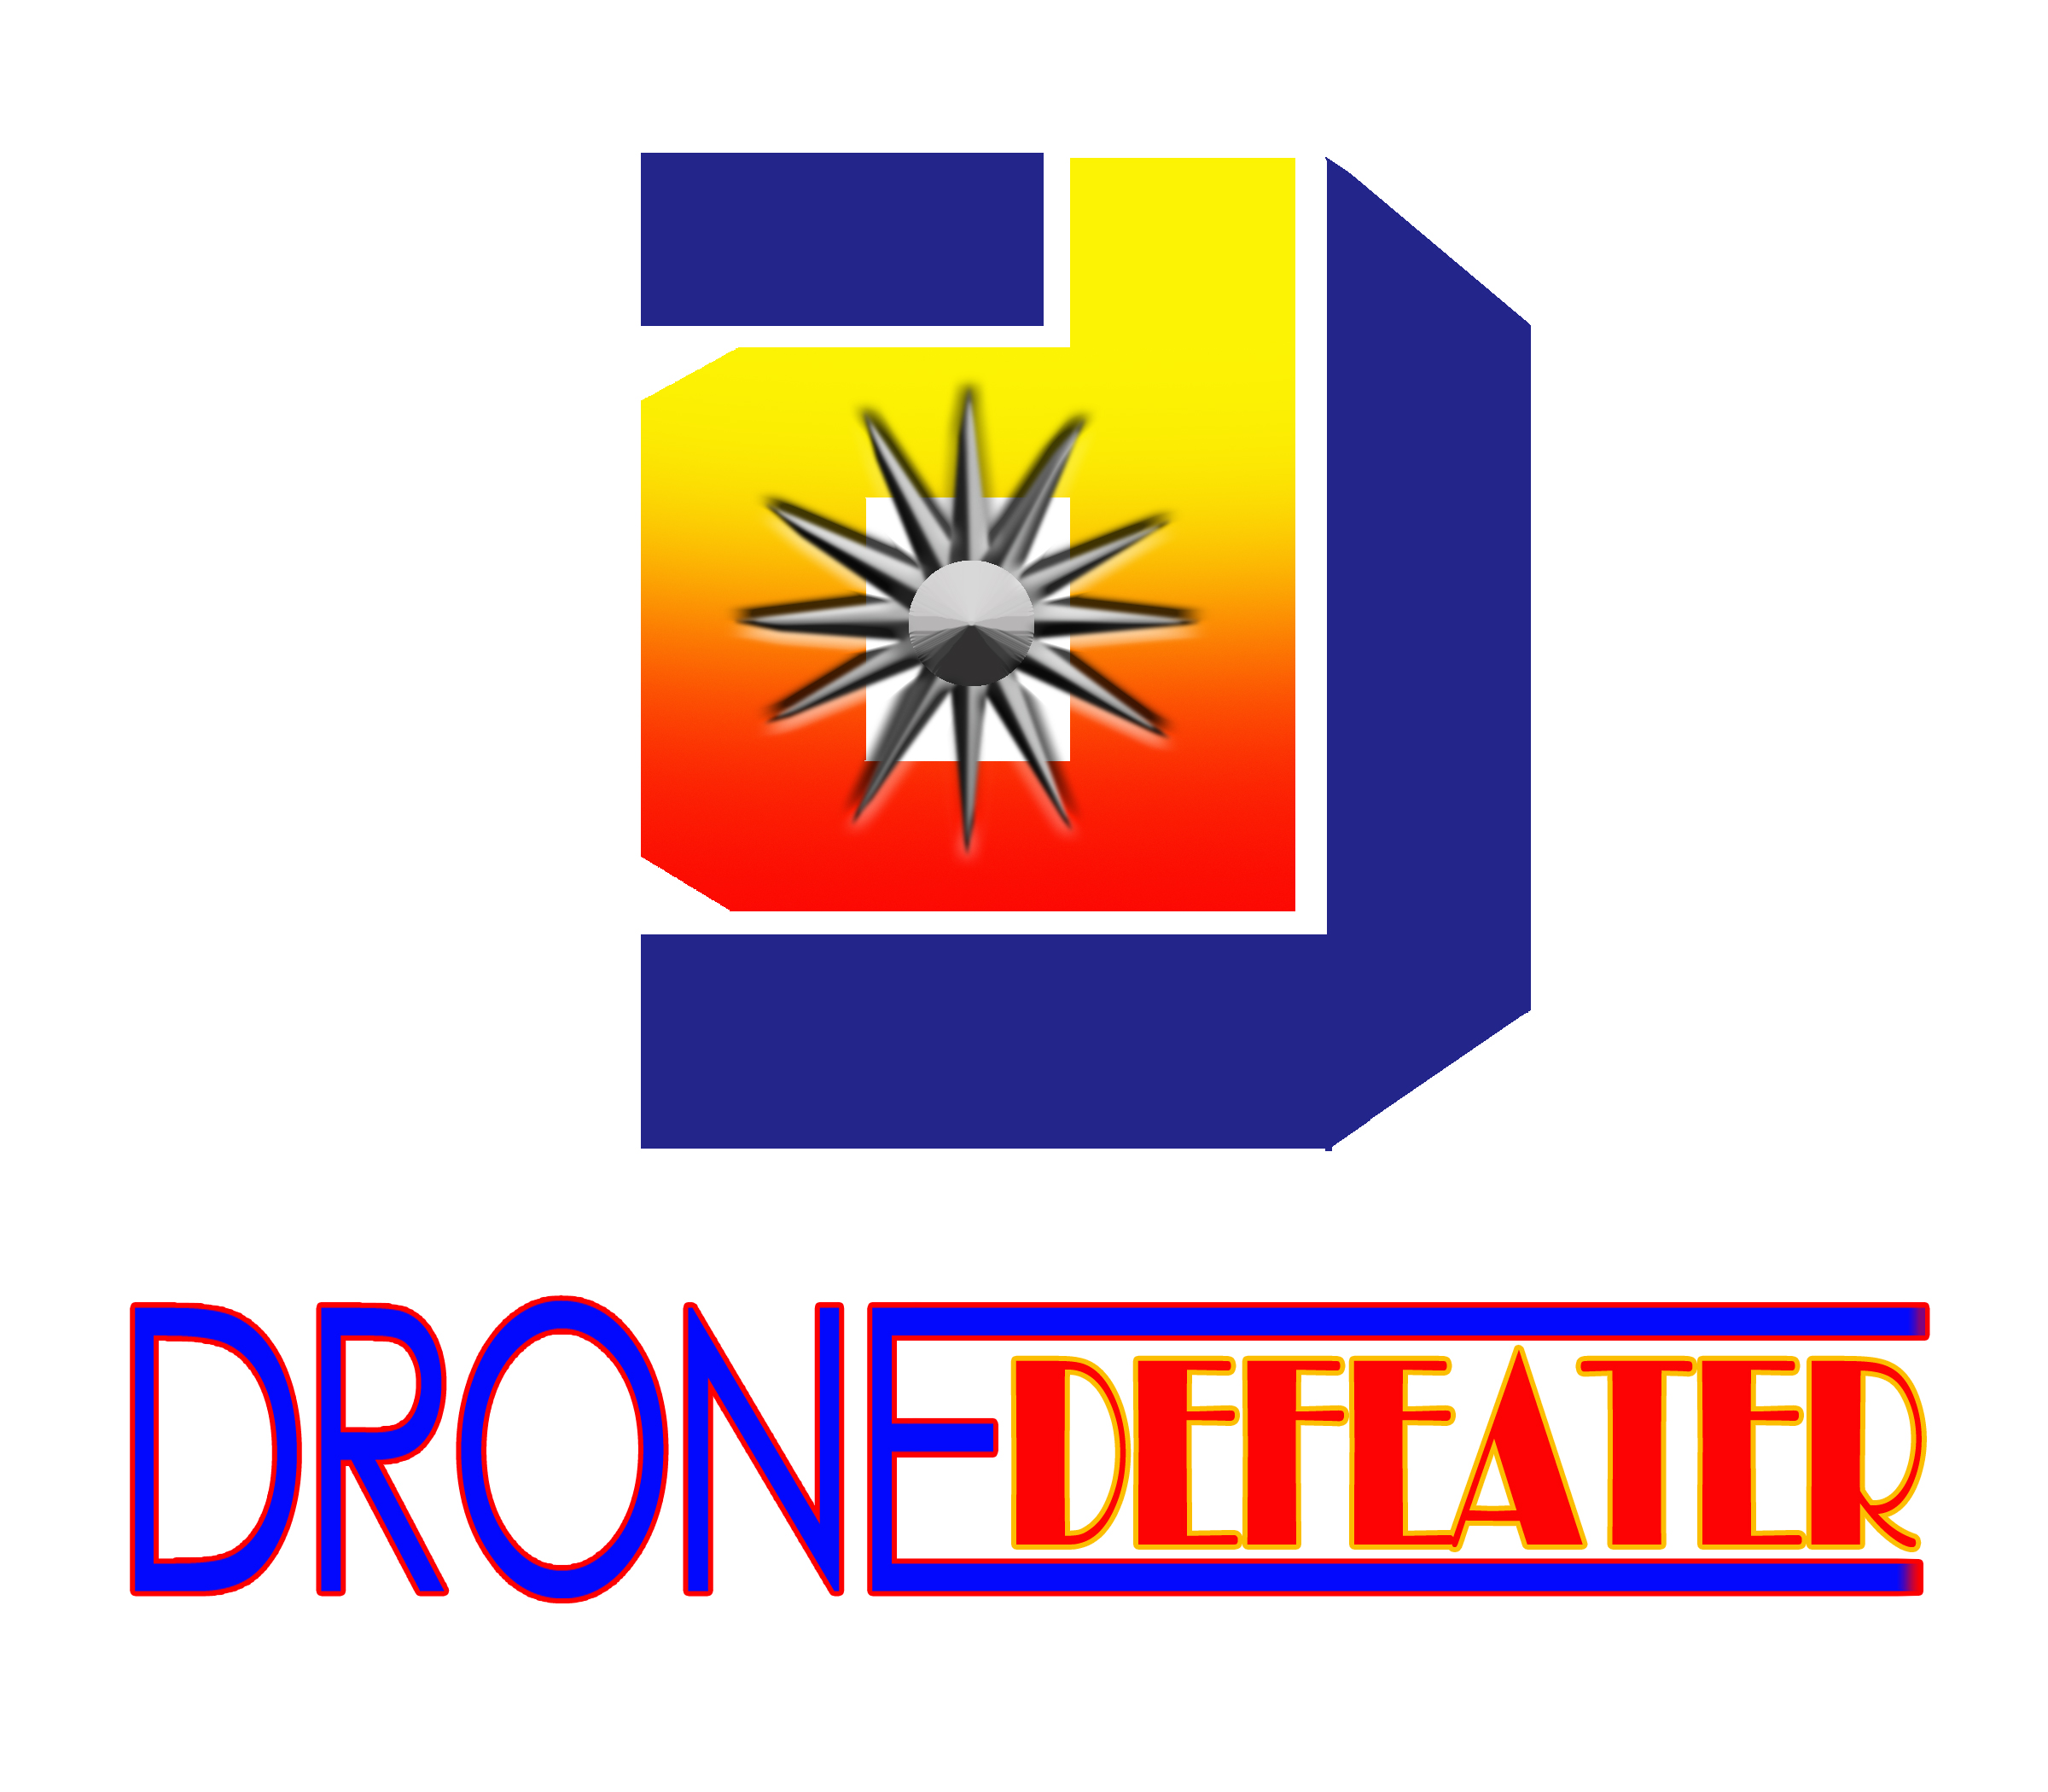 Logo Design by Kitz Malinao - Entry No. 14 in the Logo Design Contest Artistic Logo Design for Drone Defeater.